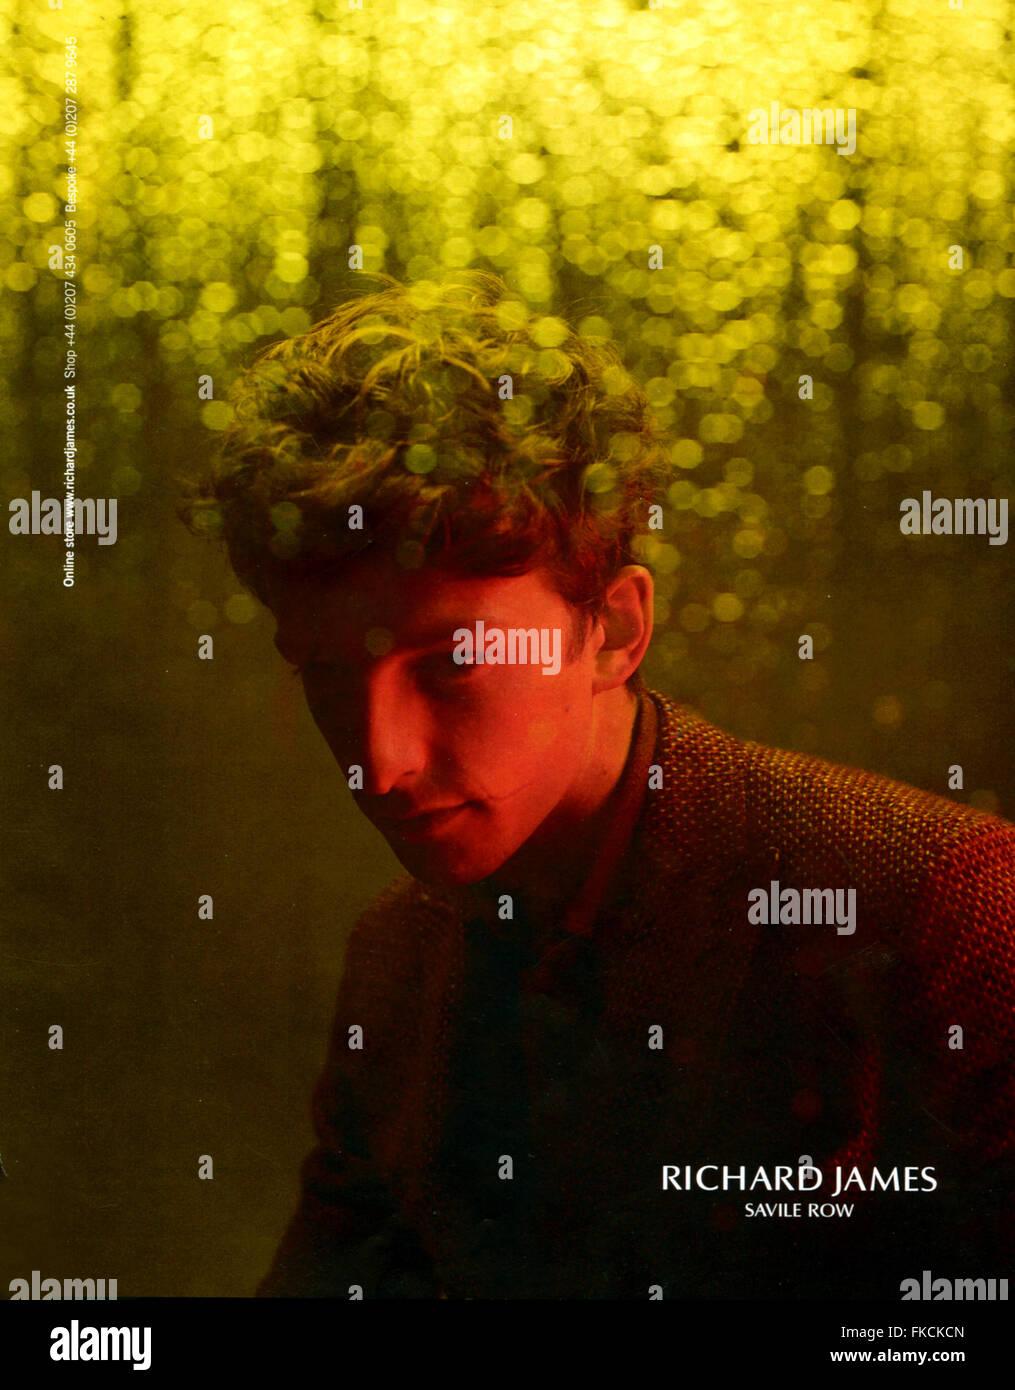 2010s UK Richard James Magazine Advert - Stock Image